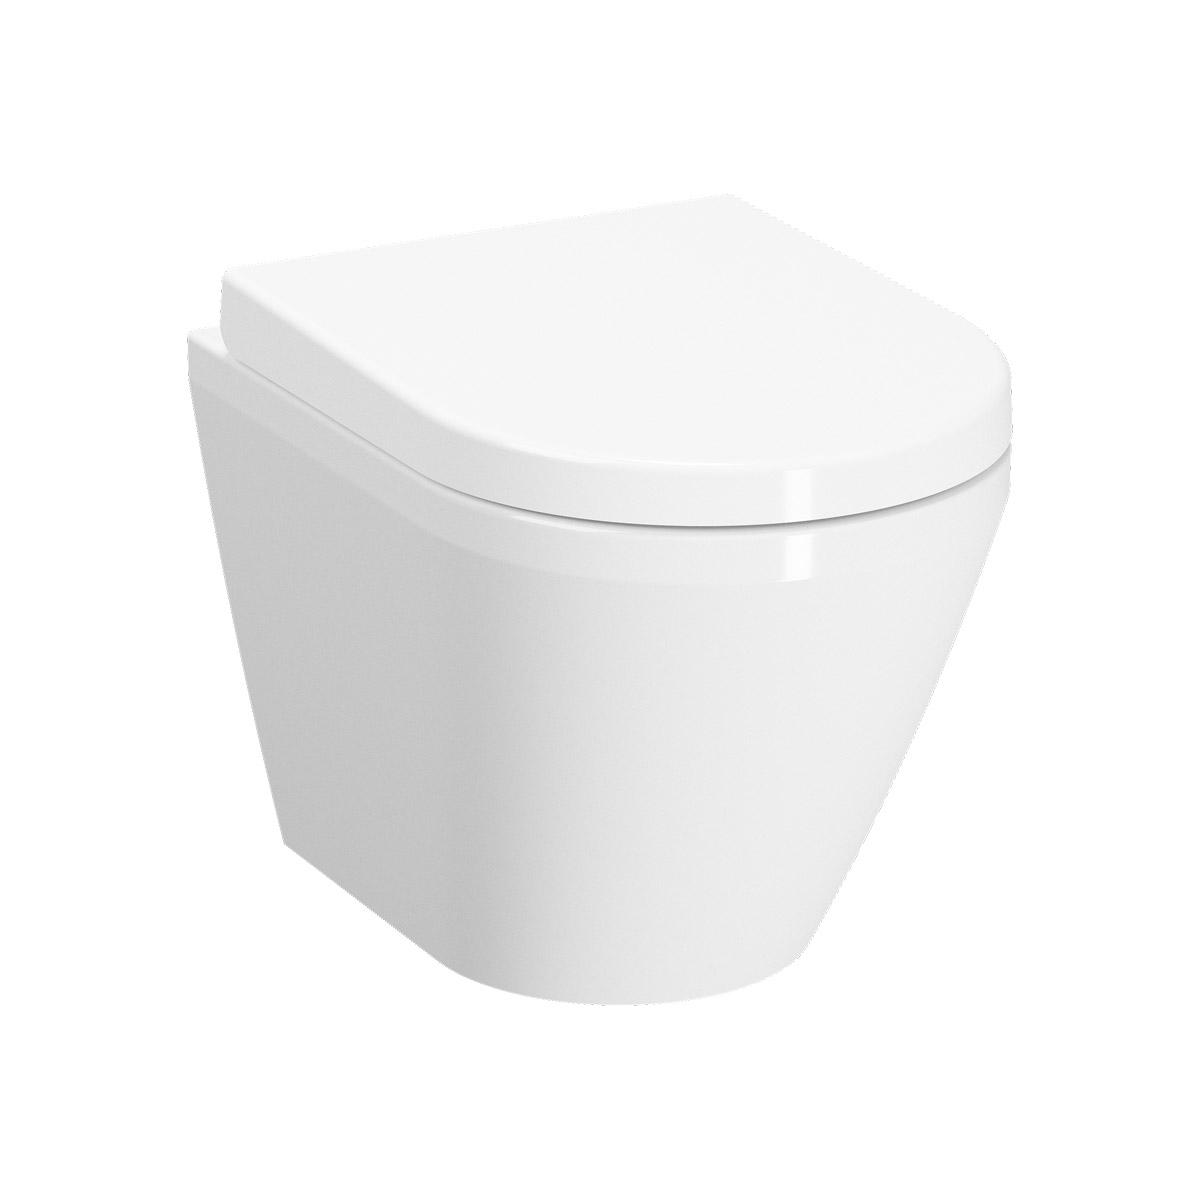 Integra Wand-WC VitrA Flush 2.0 Compact mit Bidetfunktion, Weiß